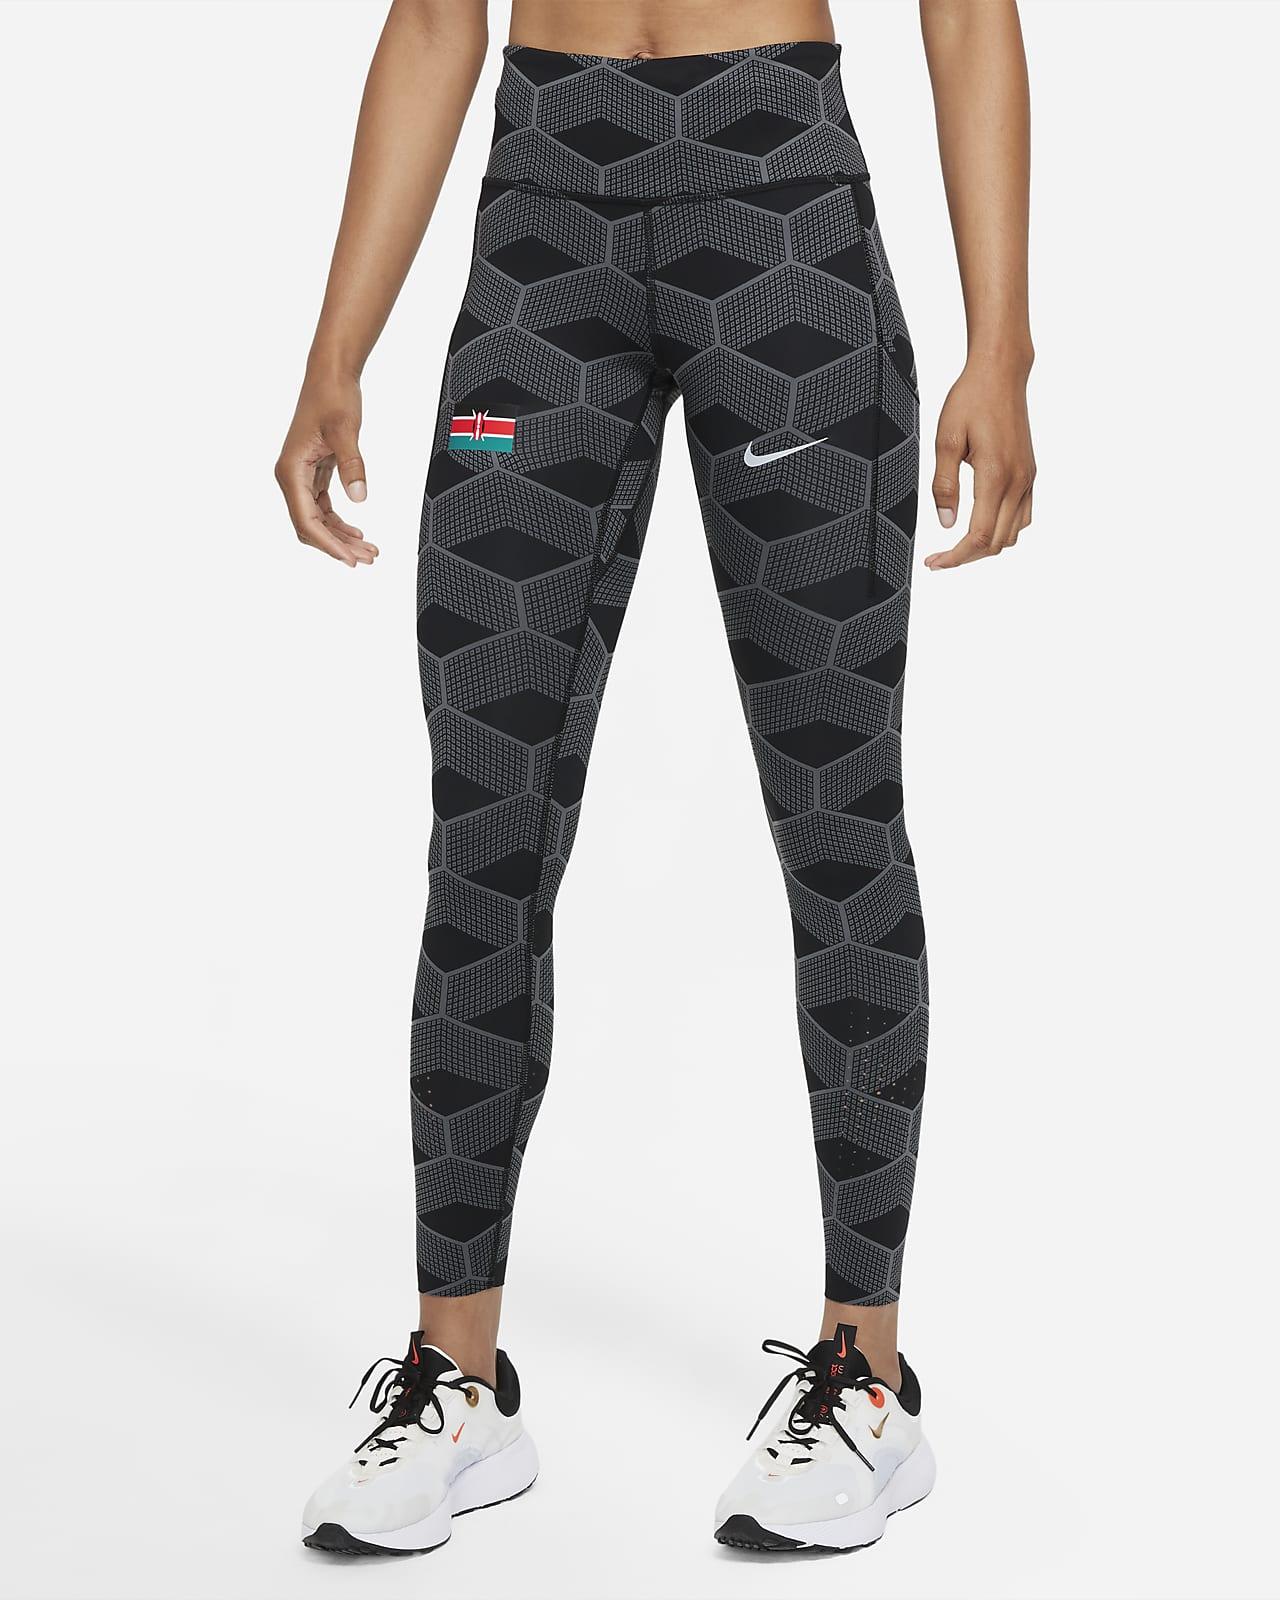 Nike Team Kenya Epic Luxe Leggings de running de talle medio - Mujer